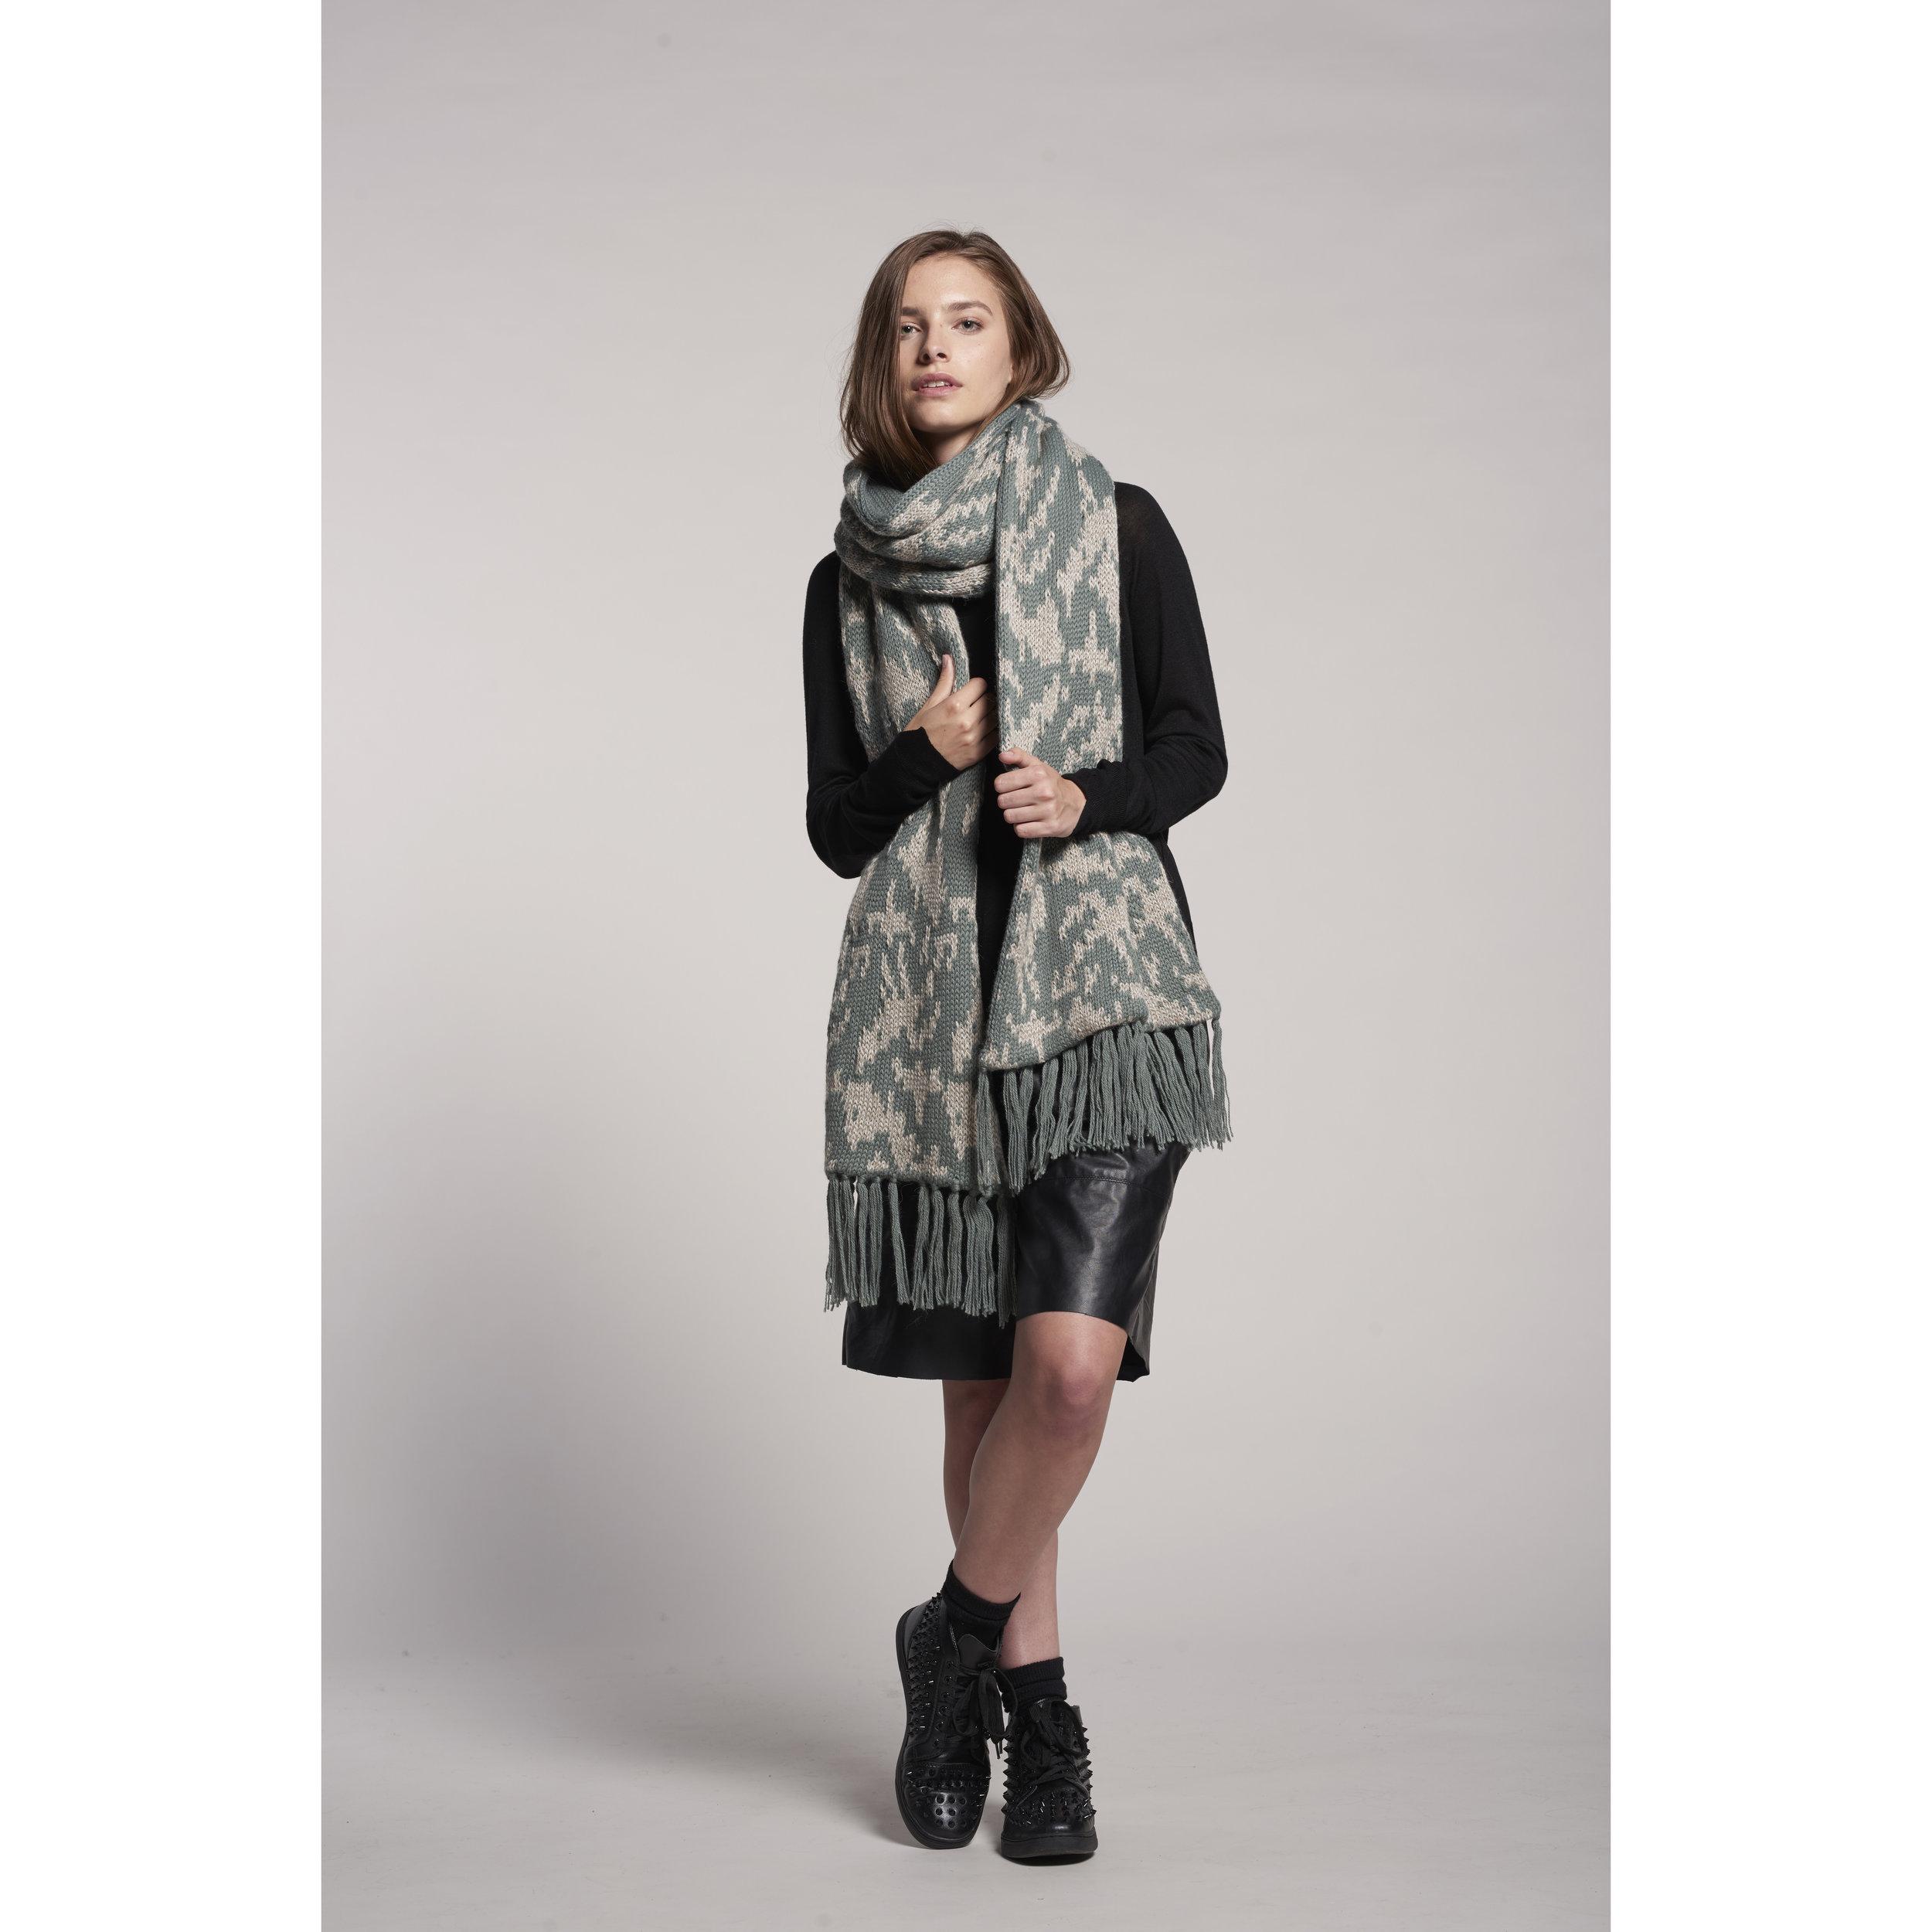 DeNada  - Long Scarf - Chic, versatile, and functional - beautifully handmade with soft alpaca fibers.